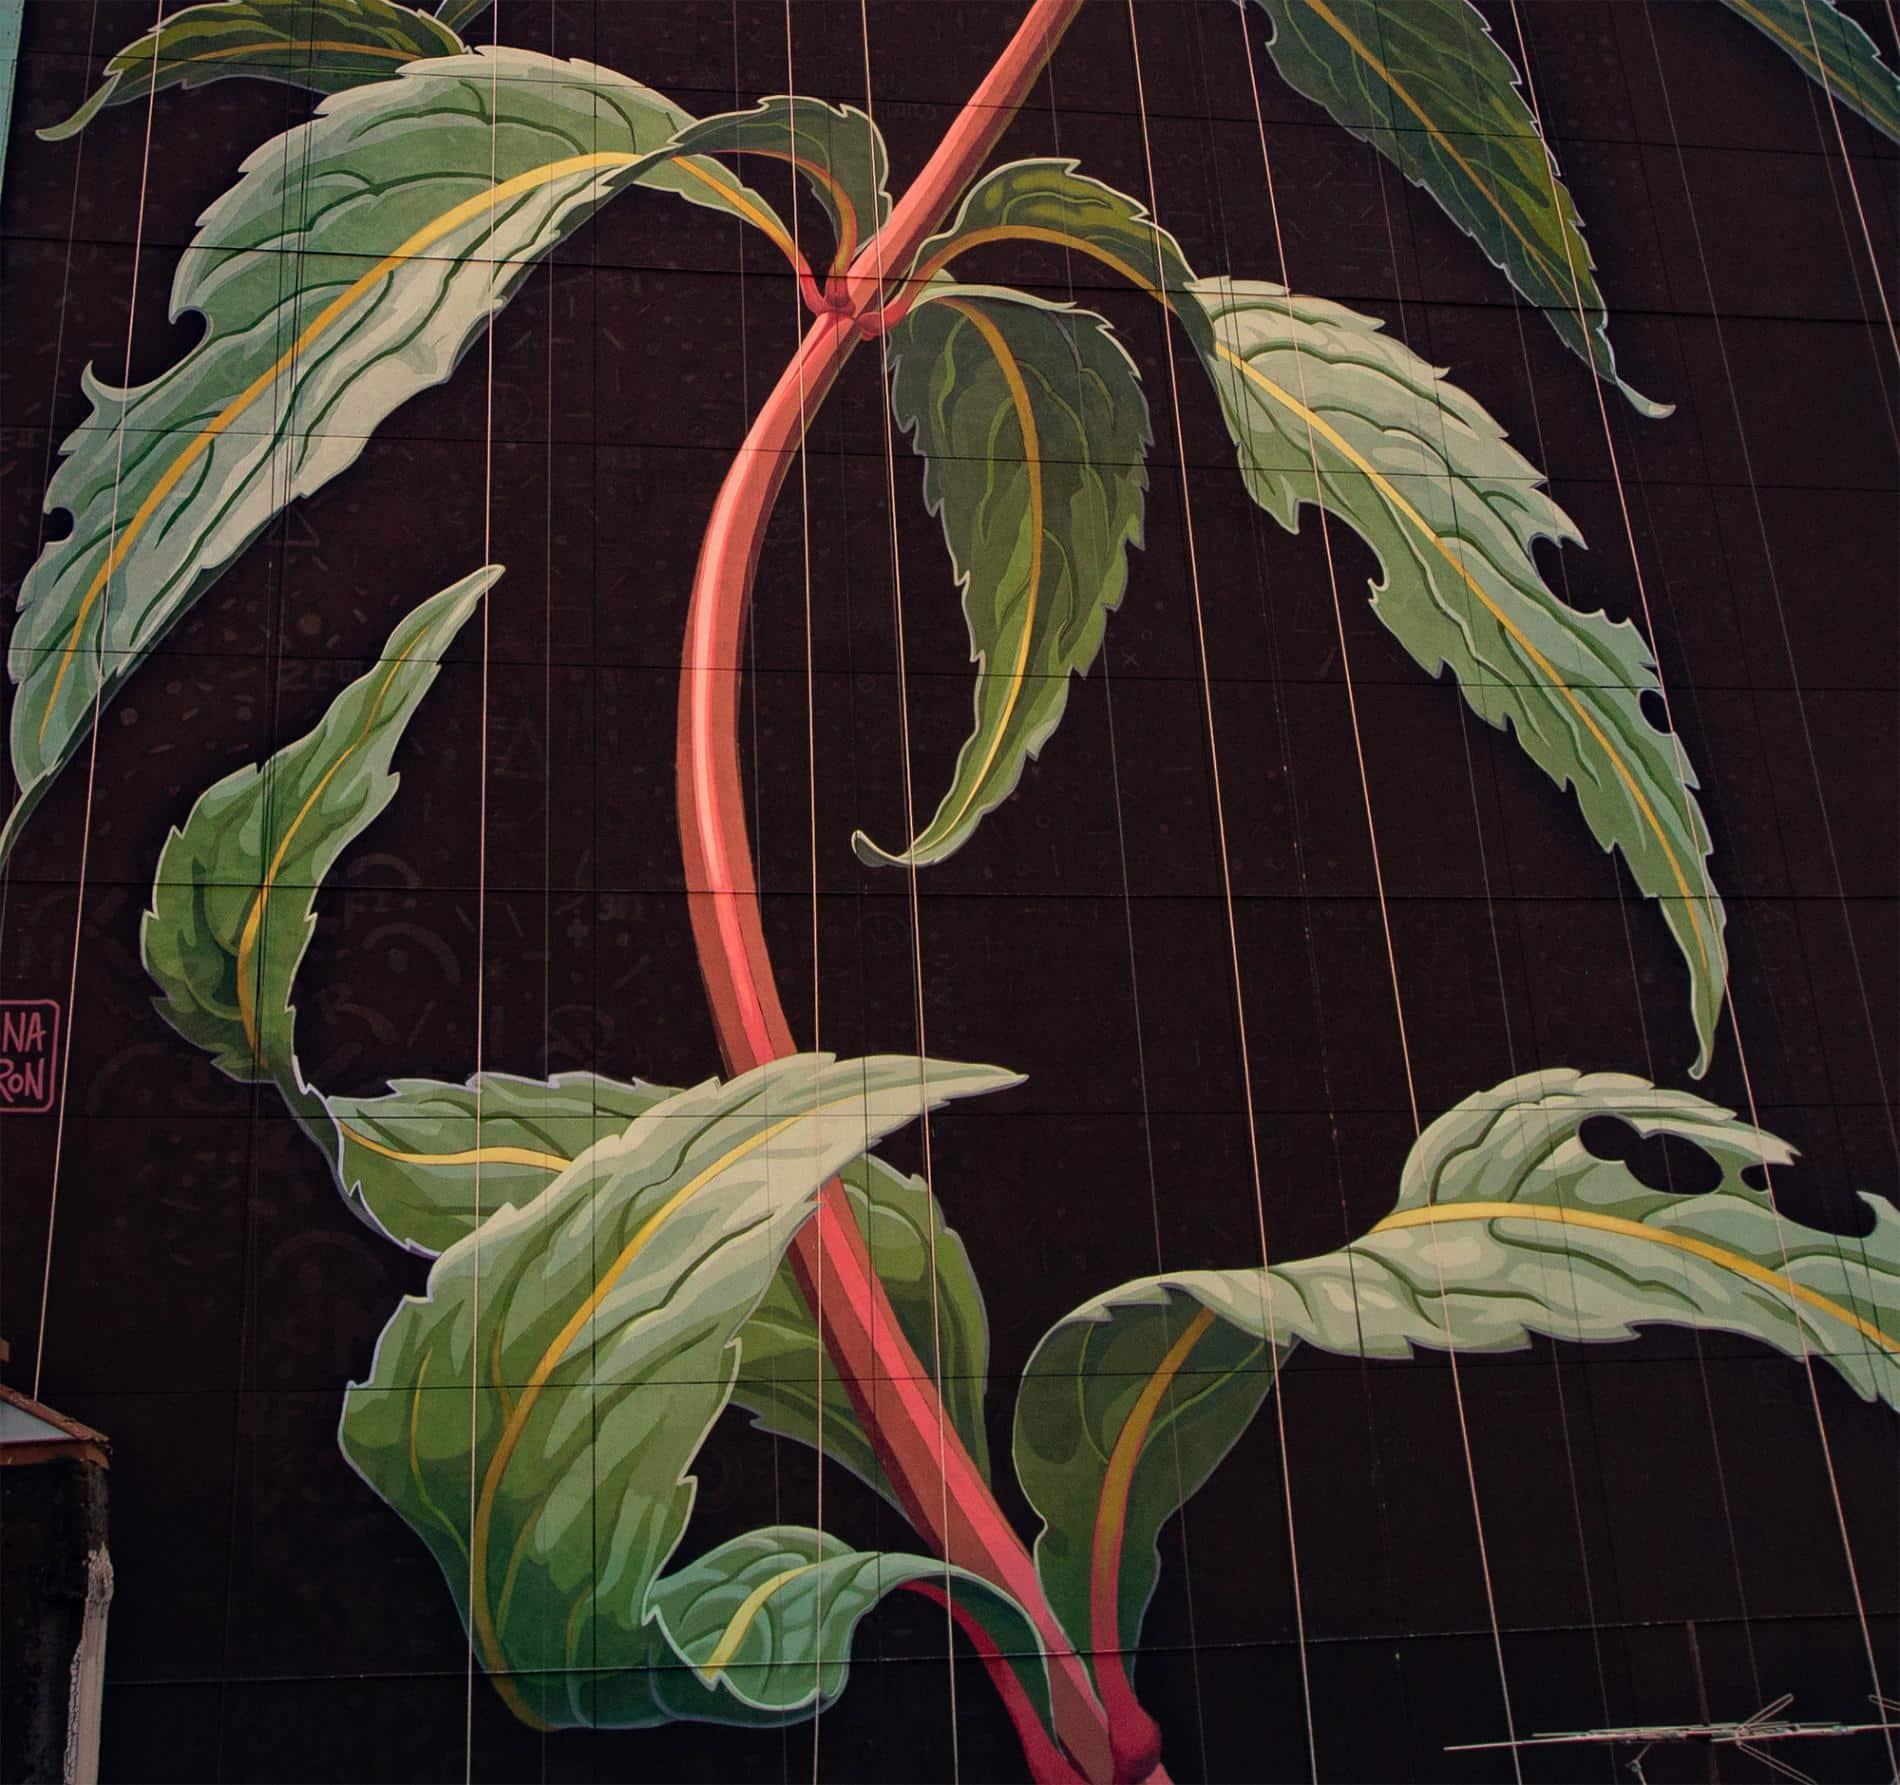 mona caron mural flor silvestre detalle